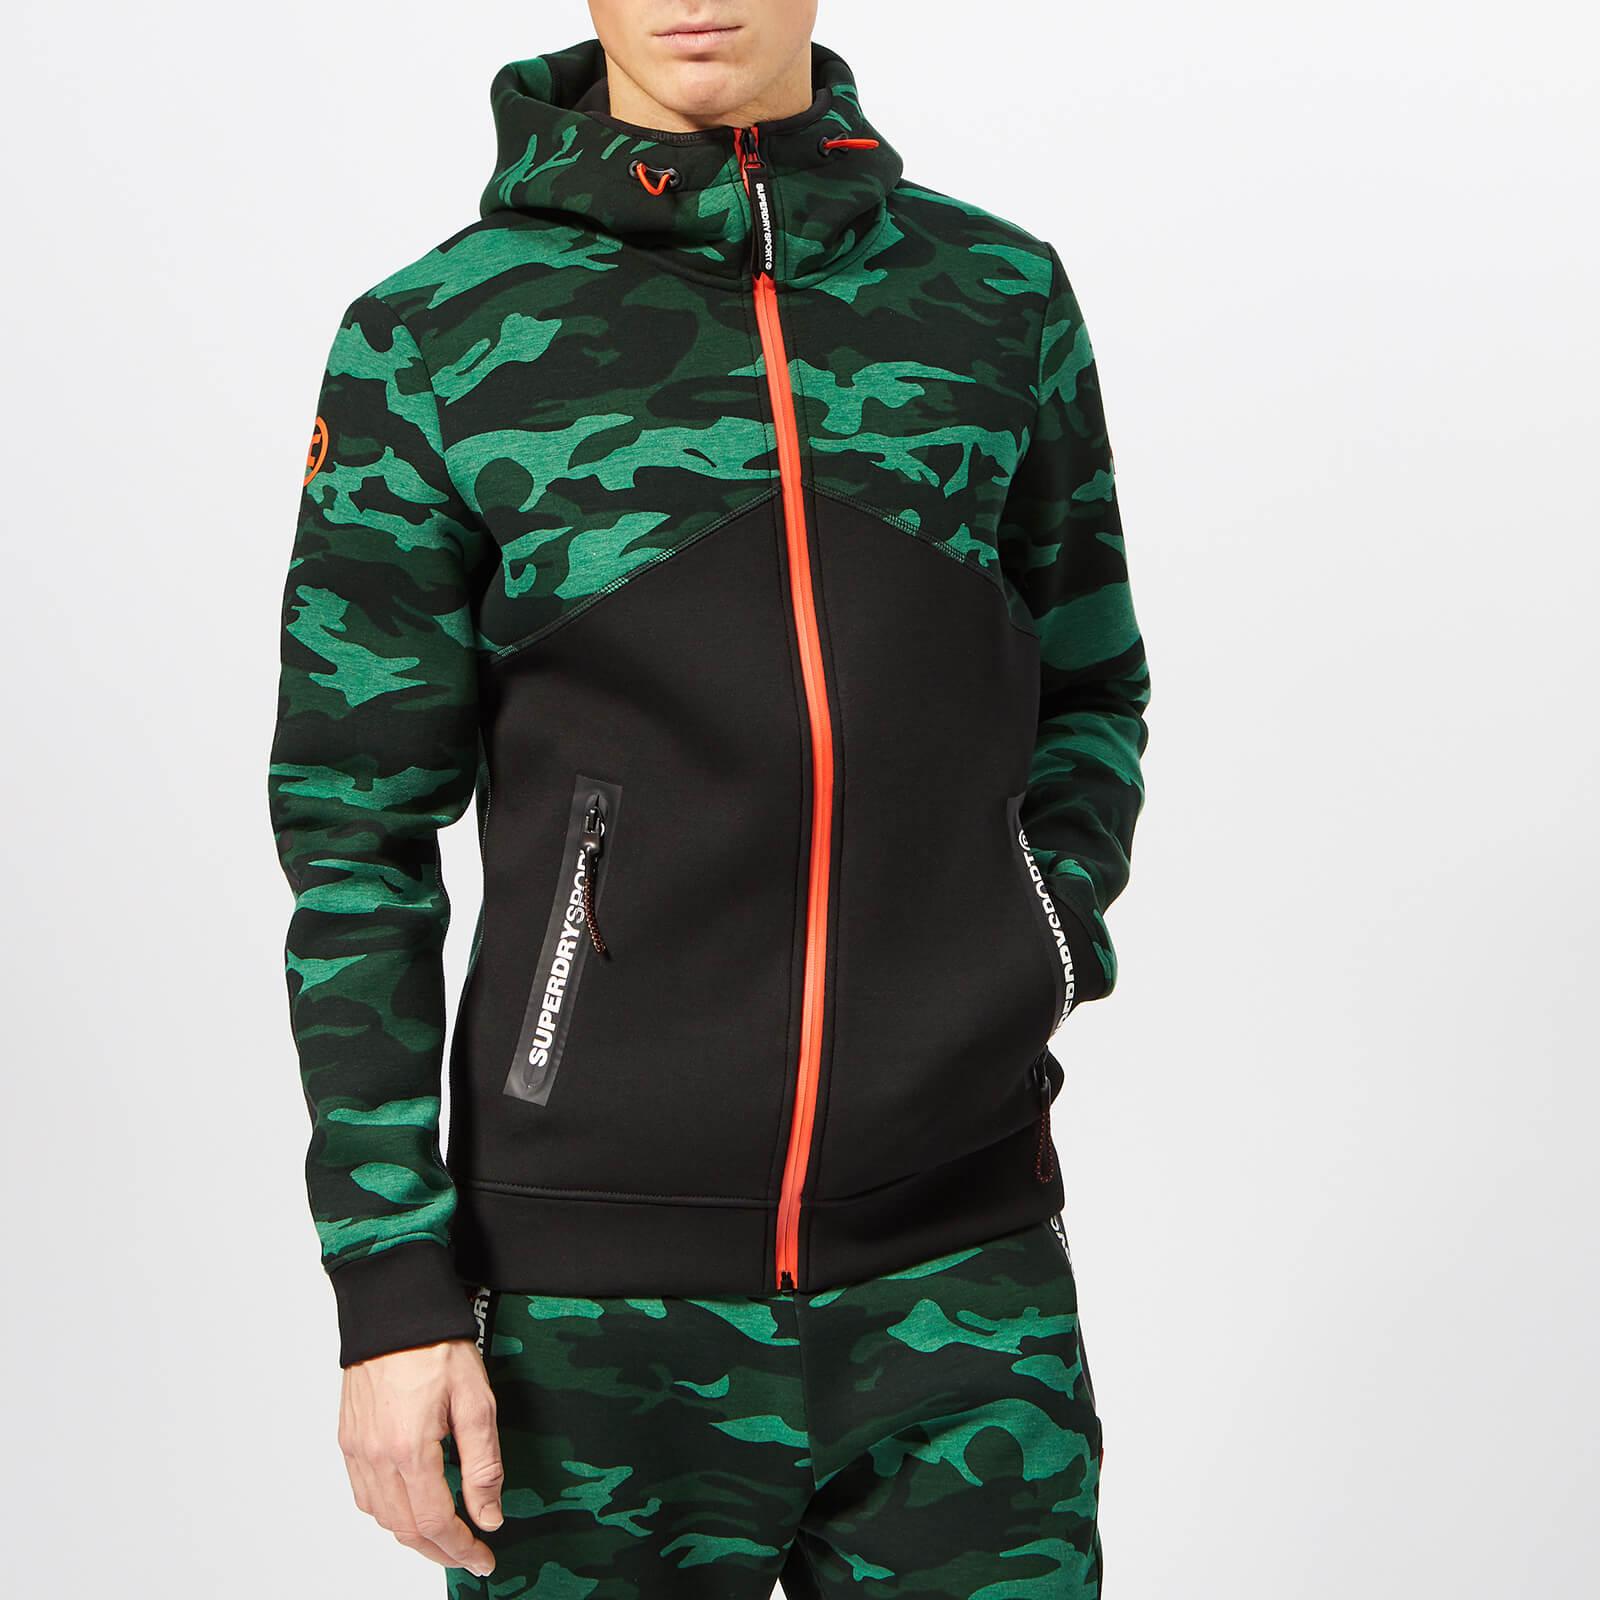 Superdry Sport Men's Gym Tech Spliced Zip Hoody - Forest Camo - L - Green